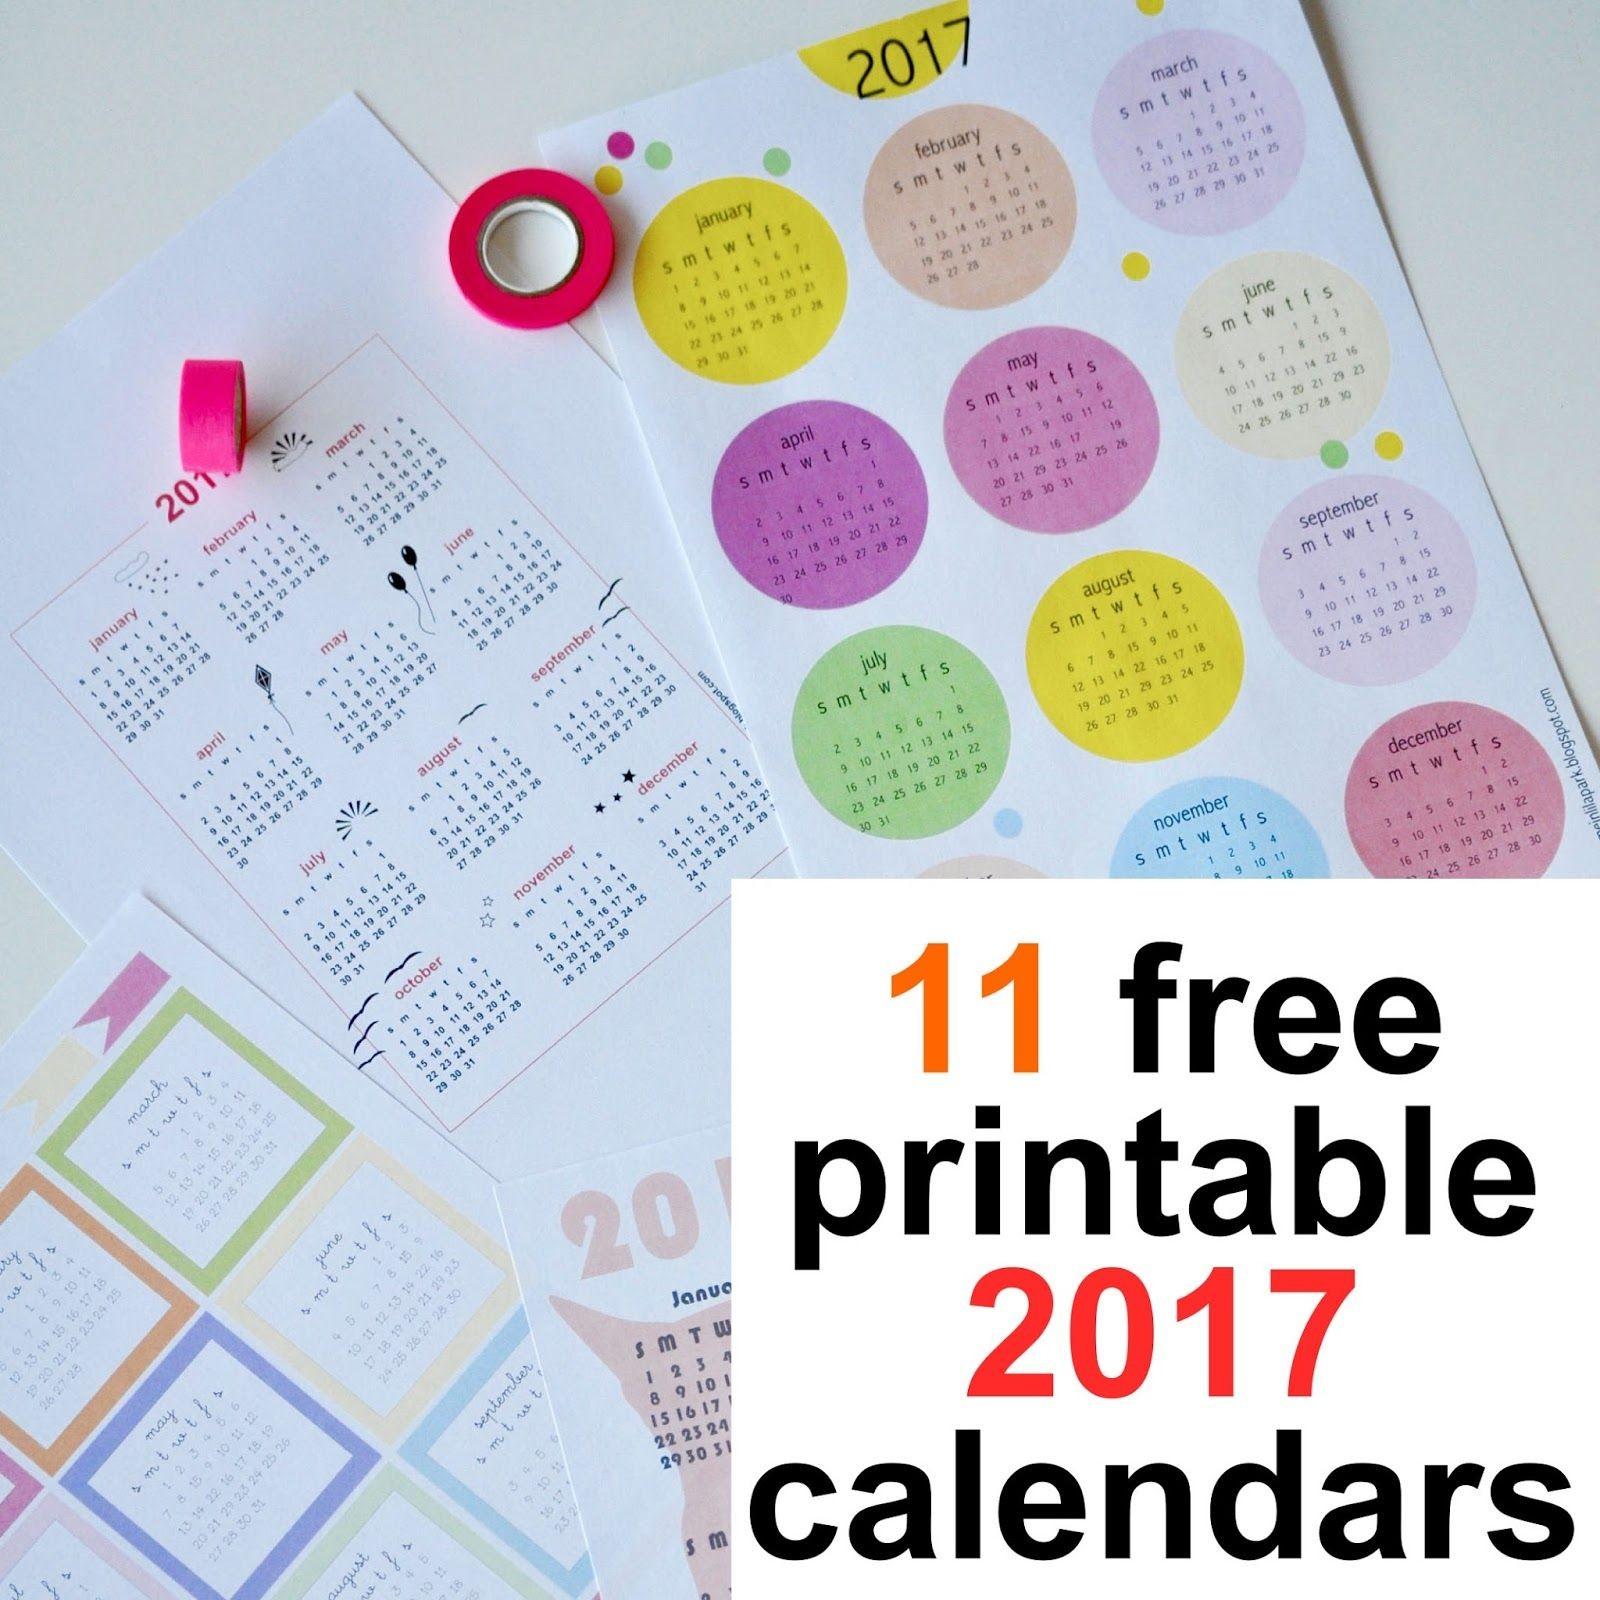 Free printable 2017 calendars round up